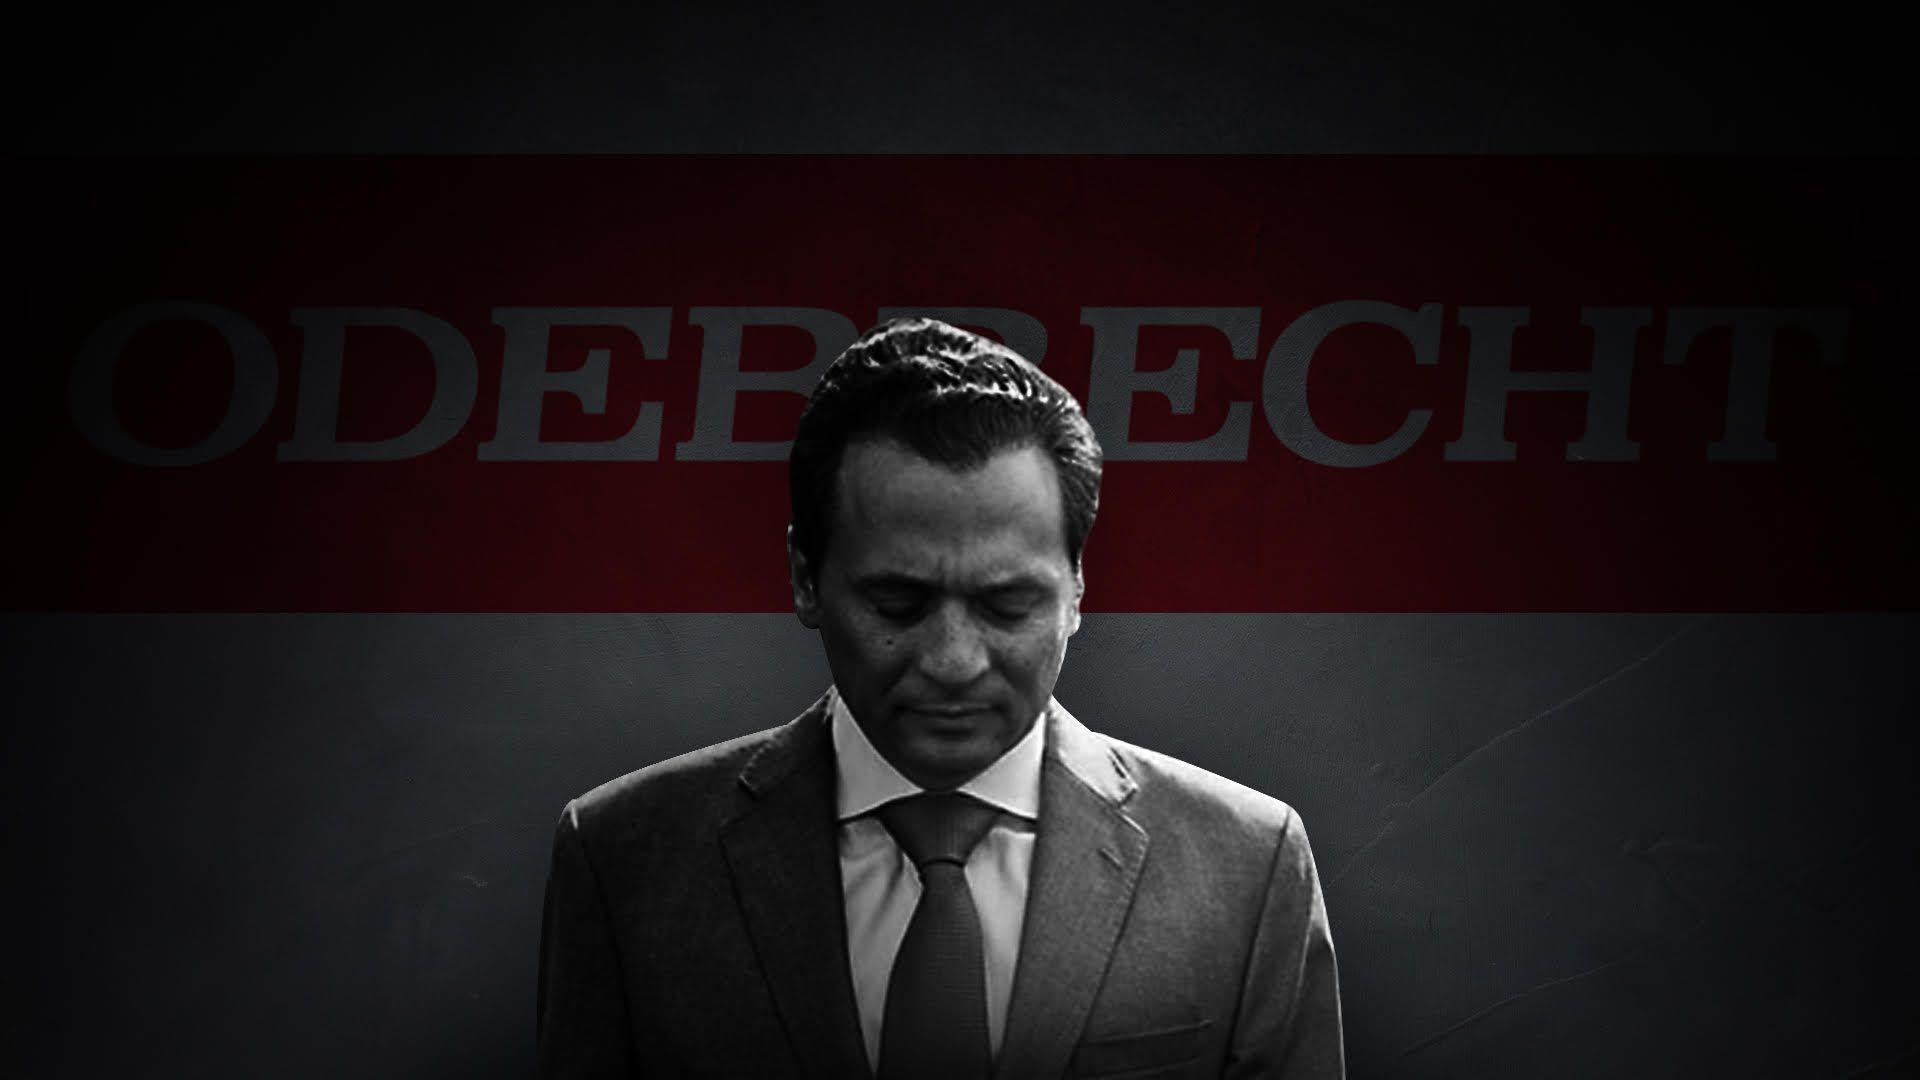 Emilio Lozoya caso Odebrecht (Foto arte: Jovani Pérez Silva/ Infobae)